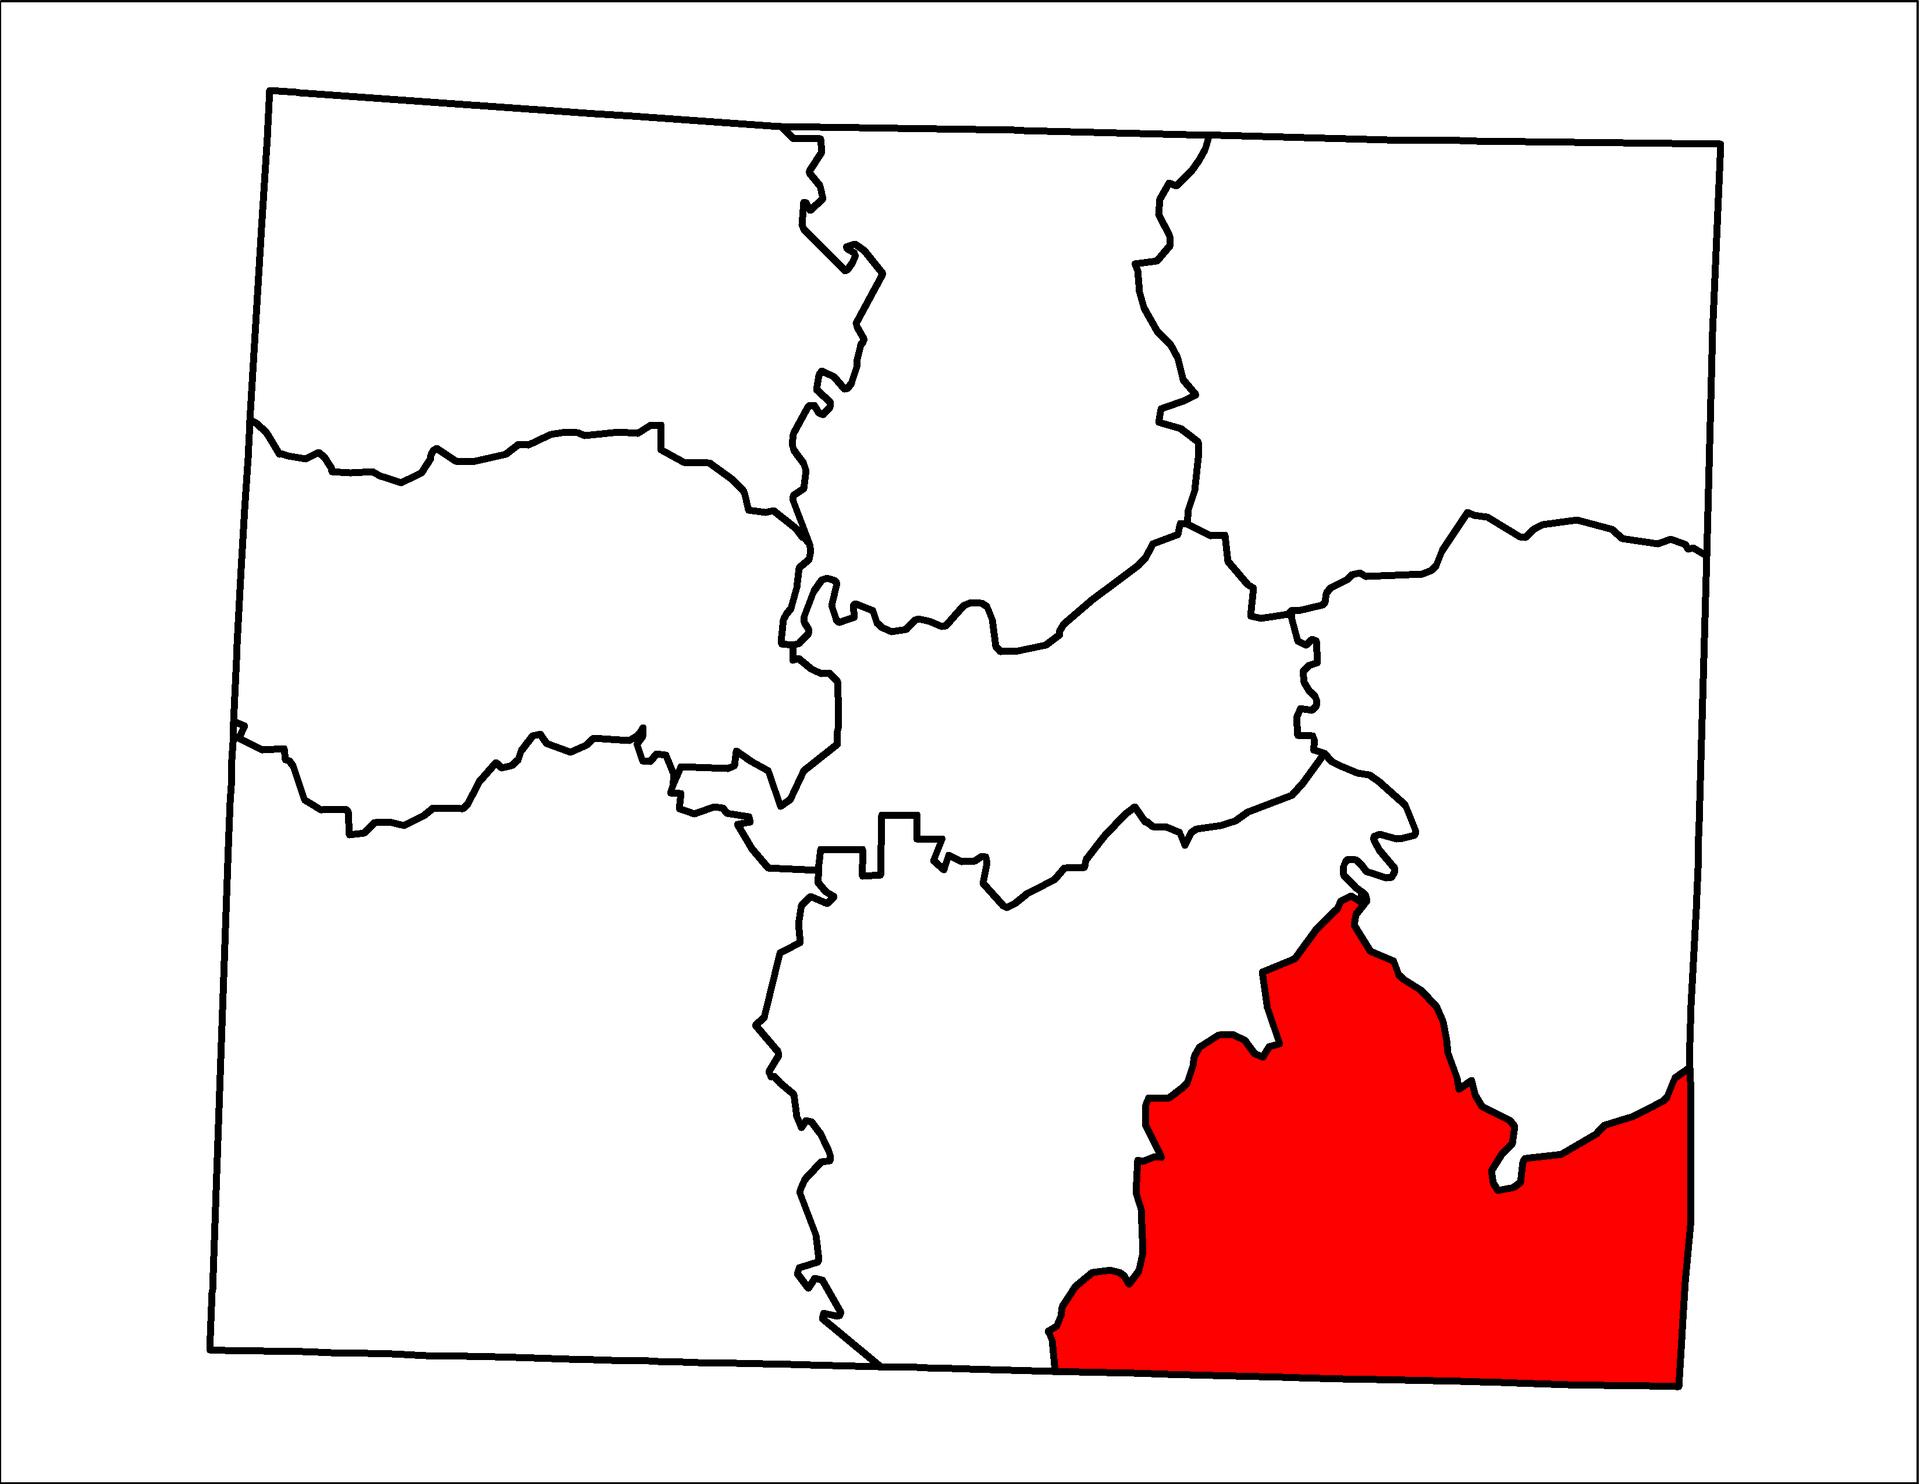 Stokes County Nc Property Tax Bill